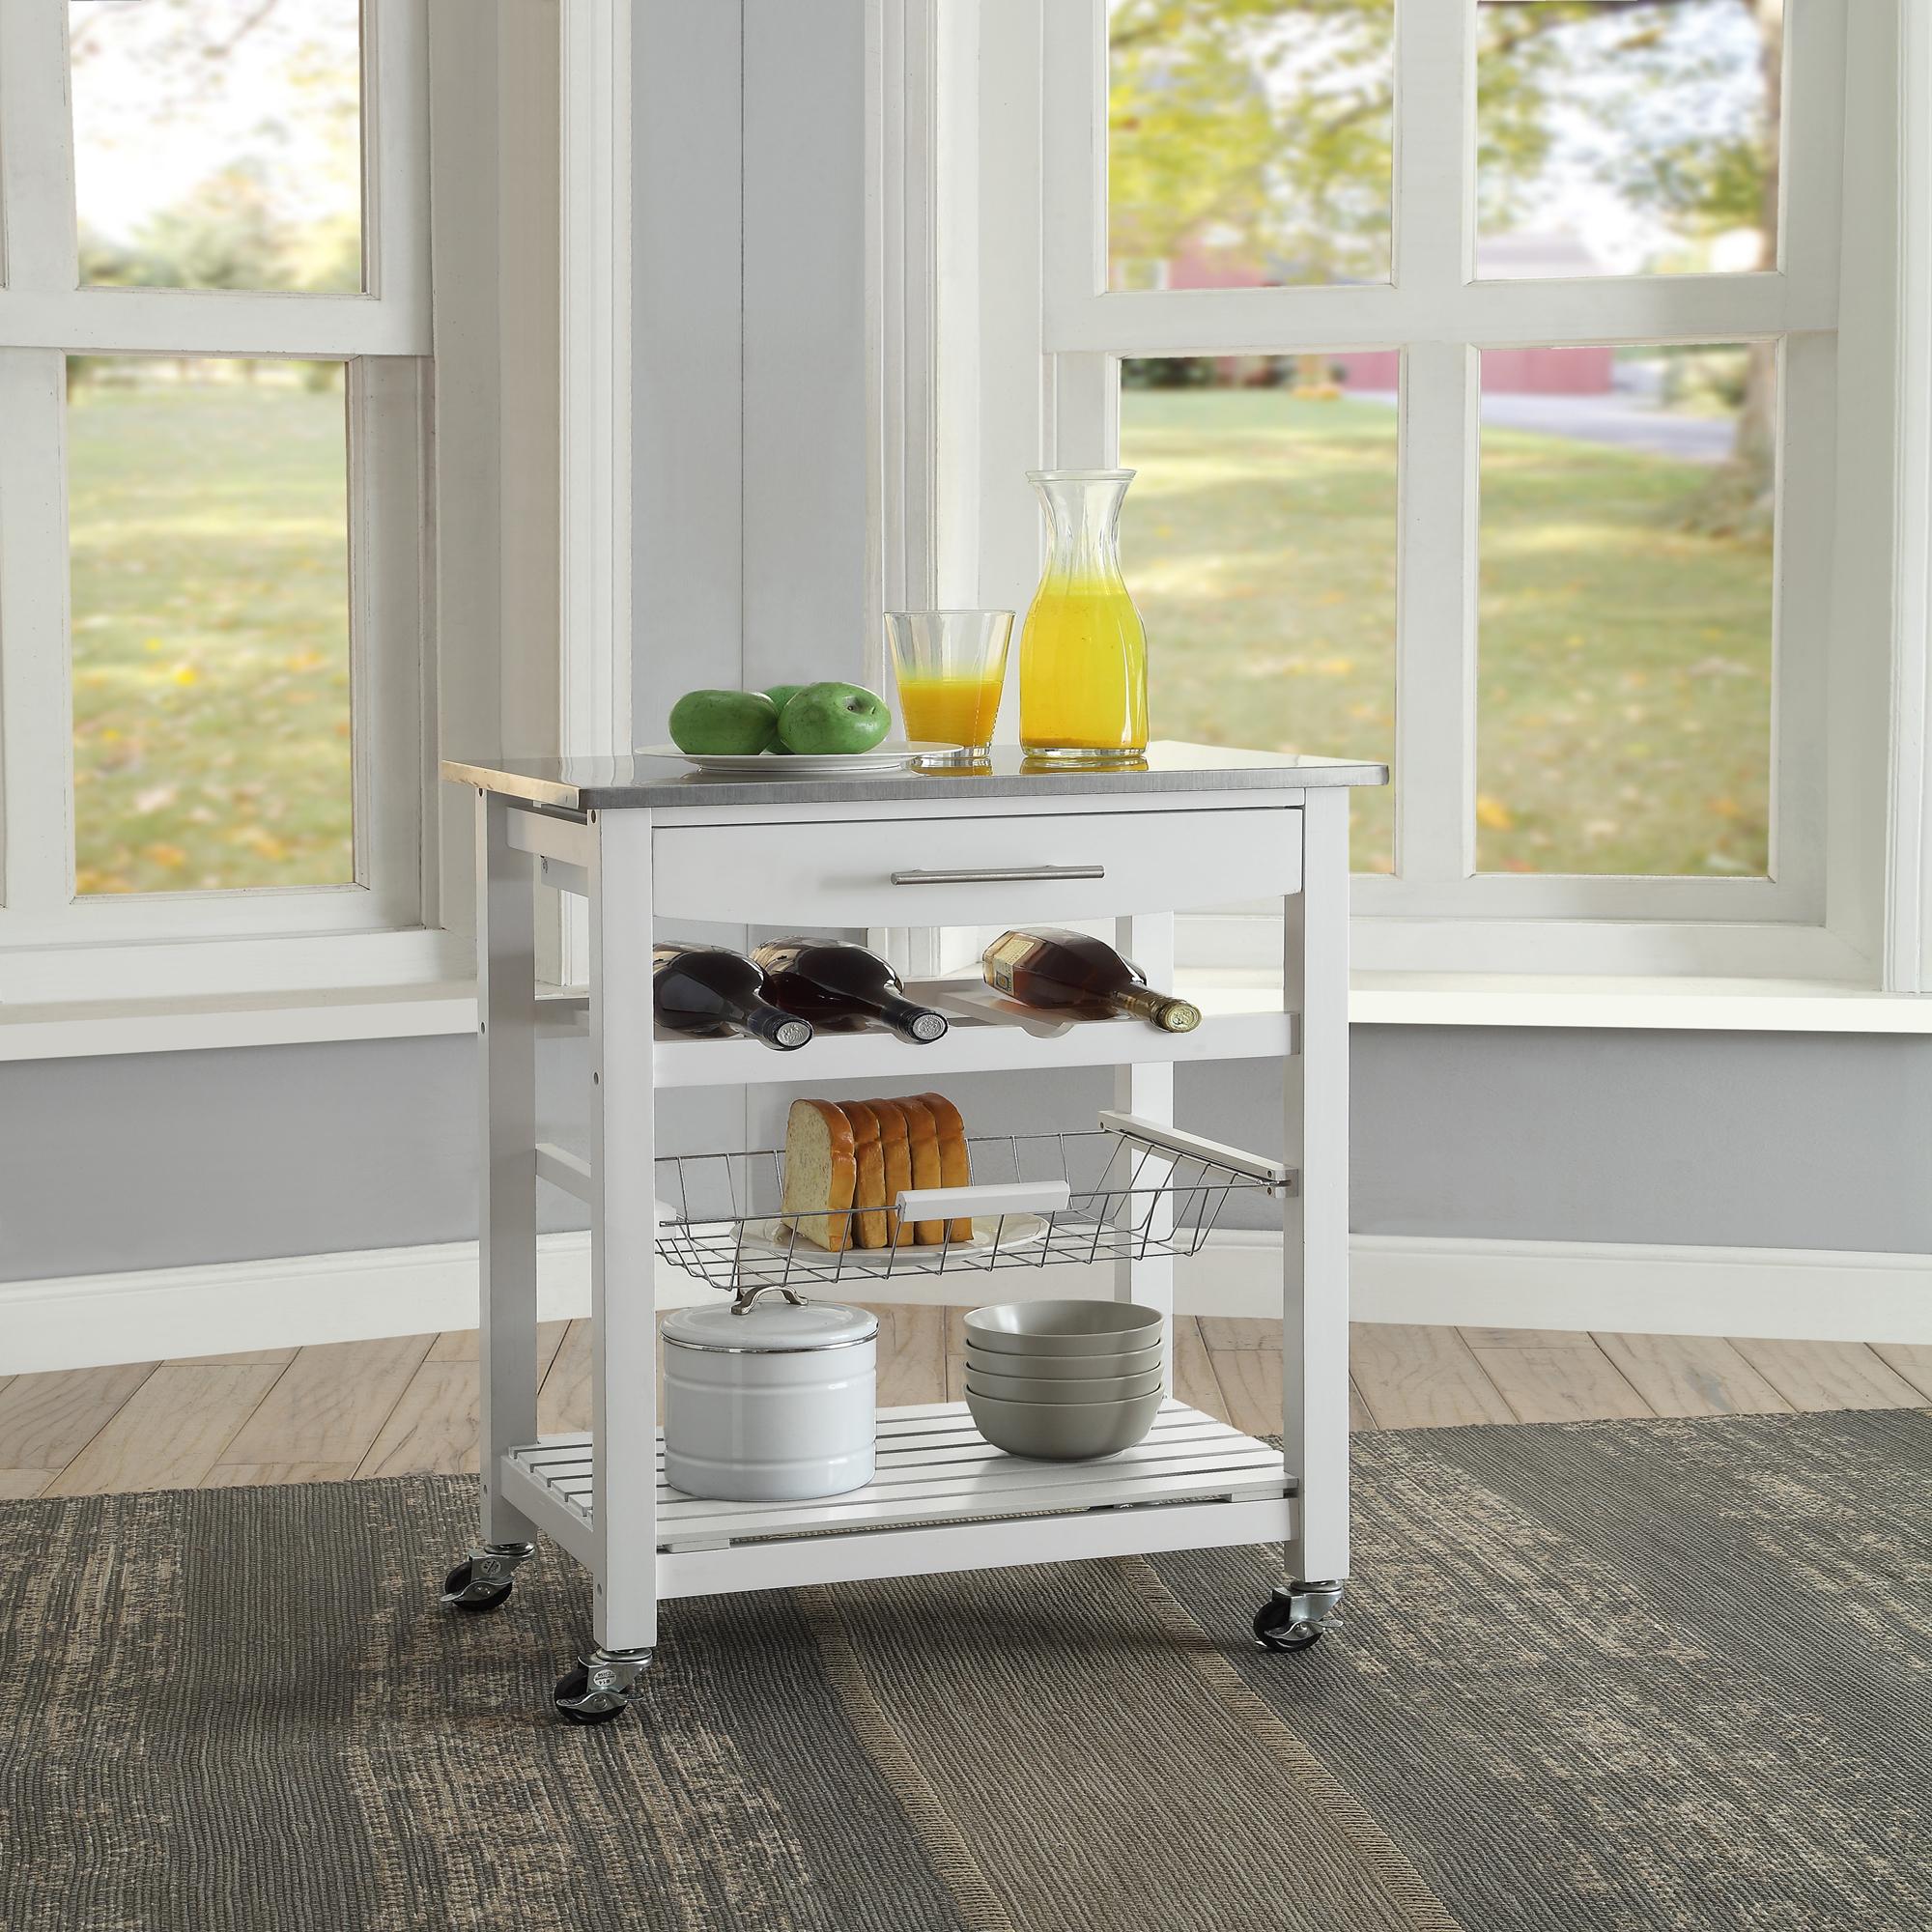 kitchen carts pinterest remodel ideas islands kmart linon clarke white cart